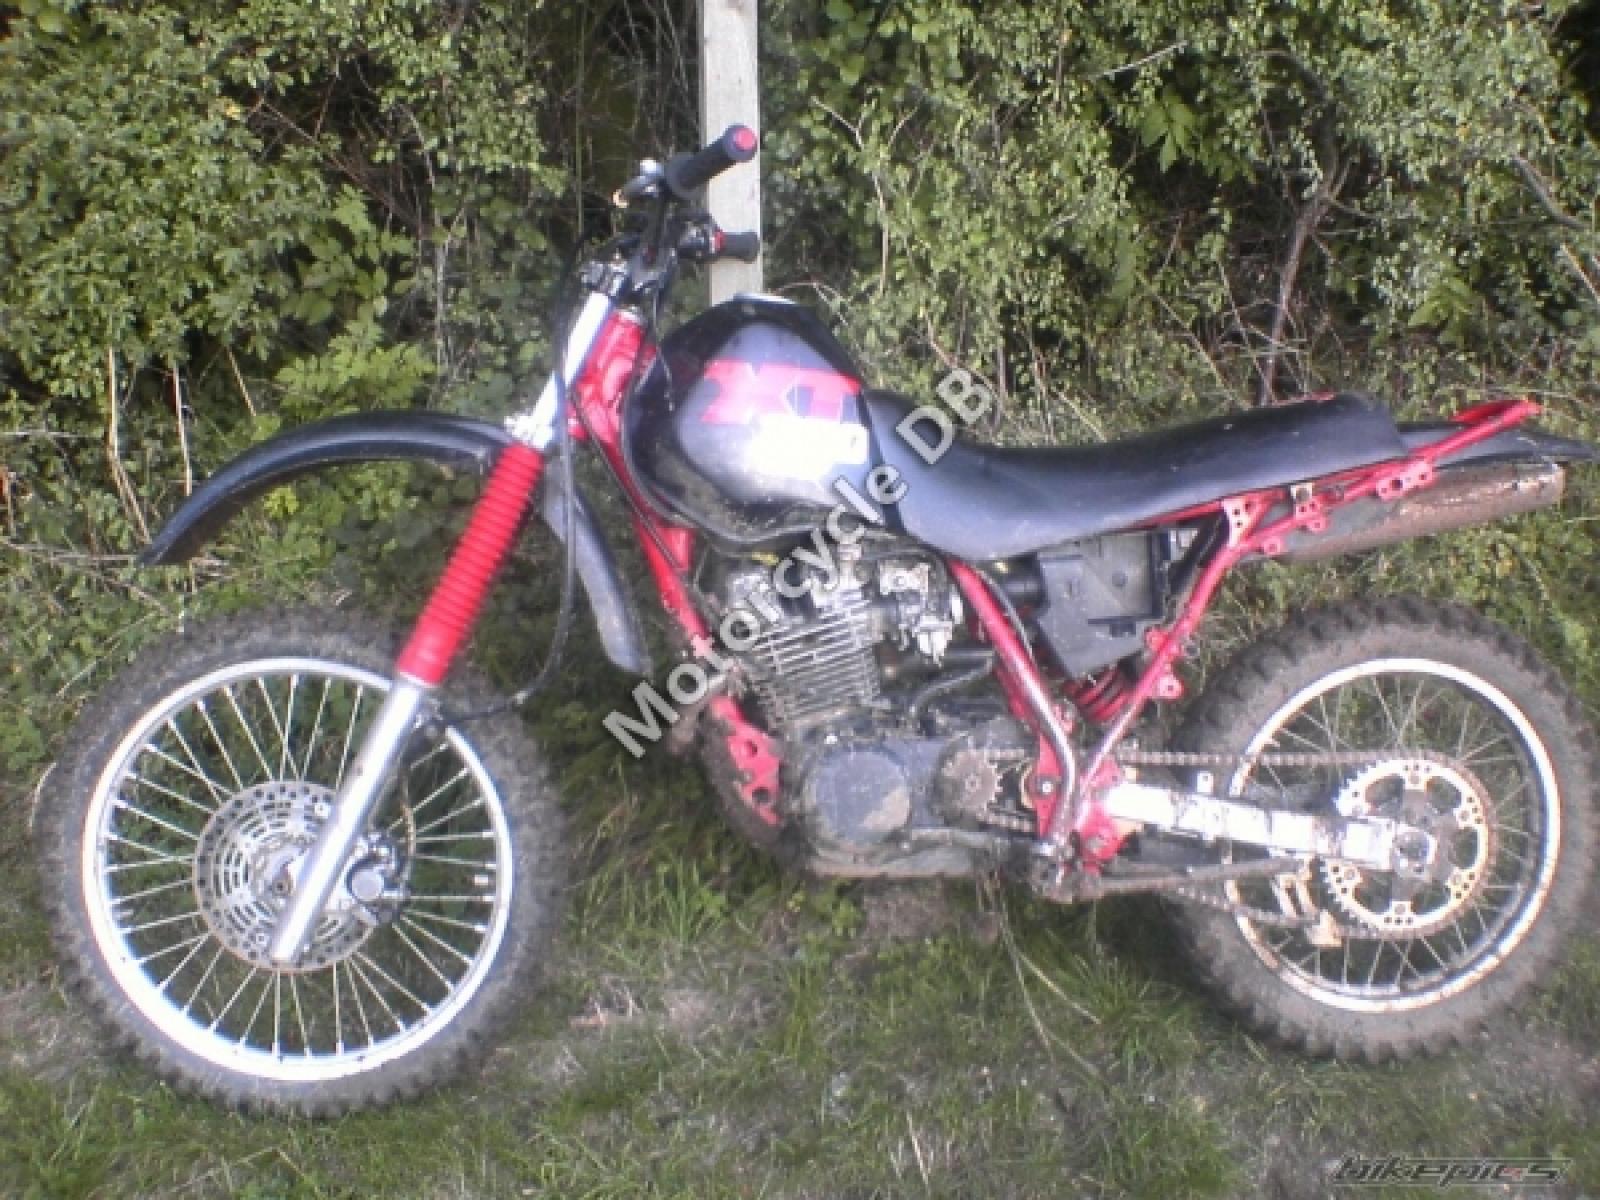 1988 yamaha moto 4 350 wiring diagram ar rifle parts xt zombdrive com